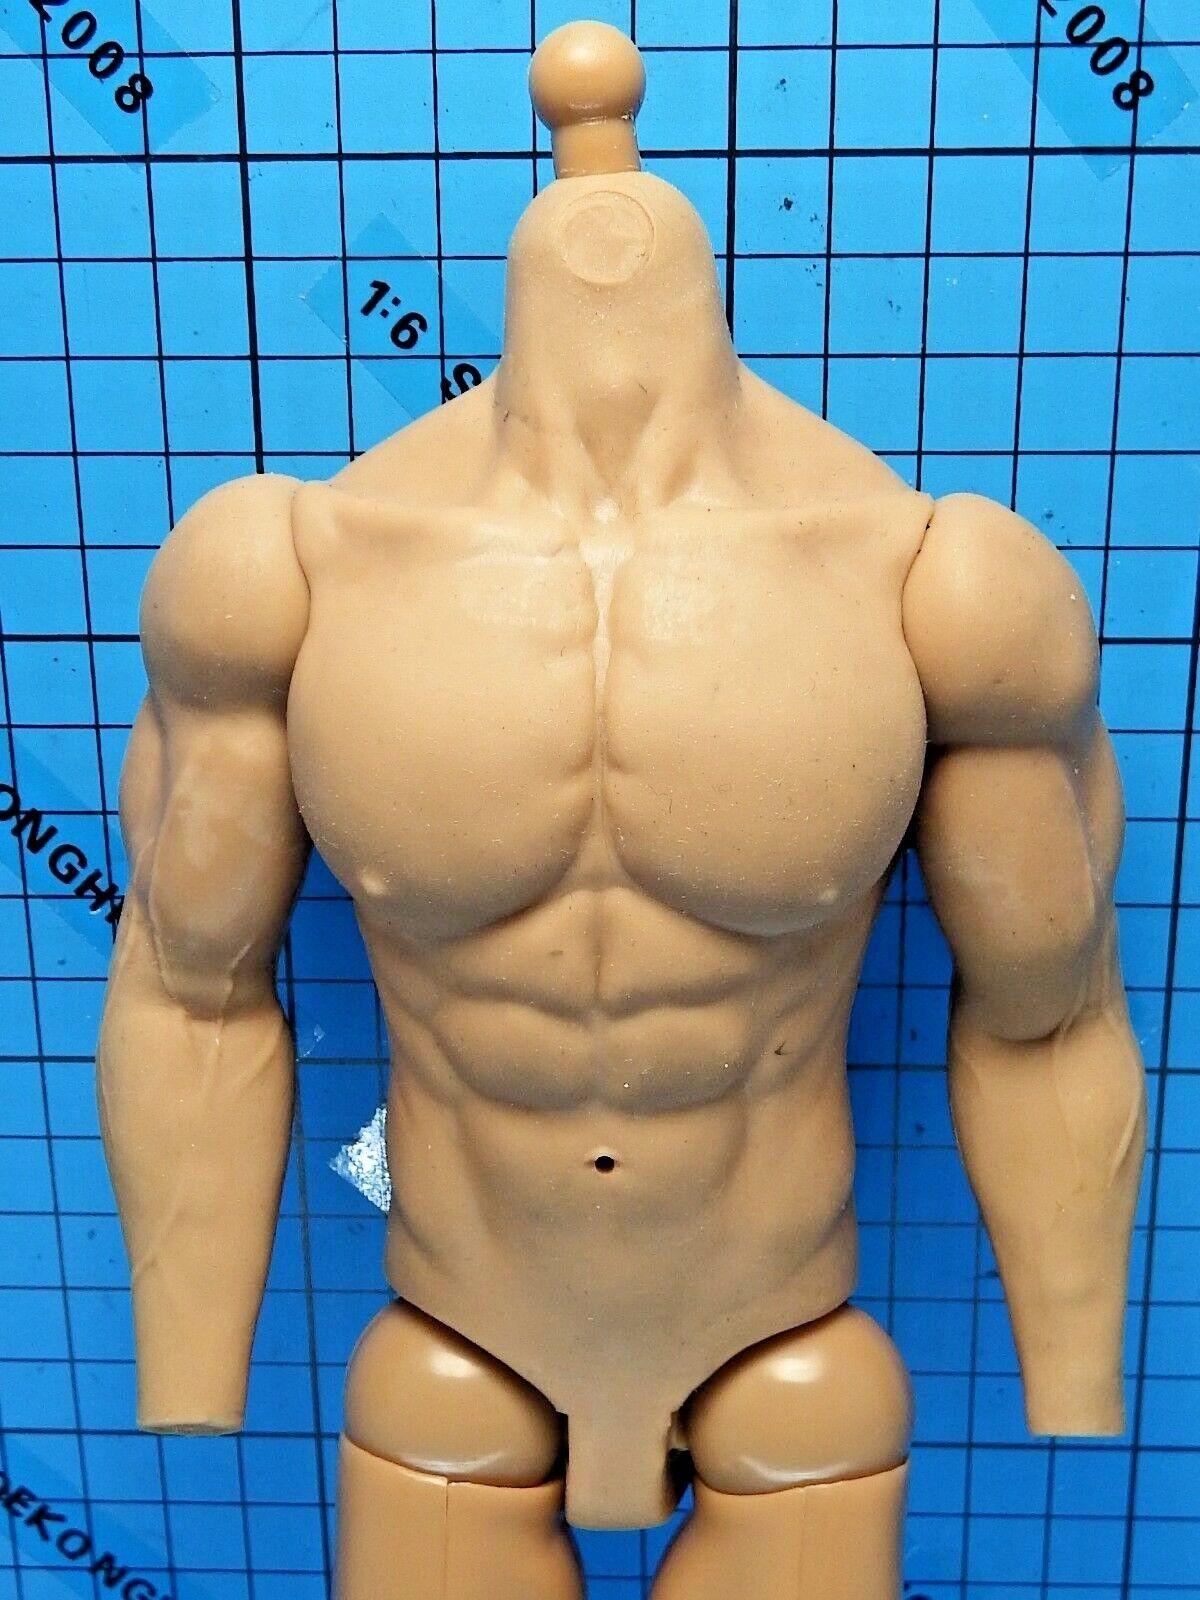 Hot Toys 1 6 Biohazard 5 VGM06 Chris Redfield BSAA Ver. Figure - Muscular Body